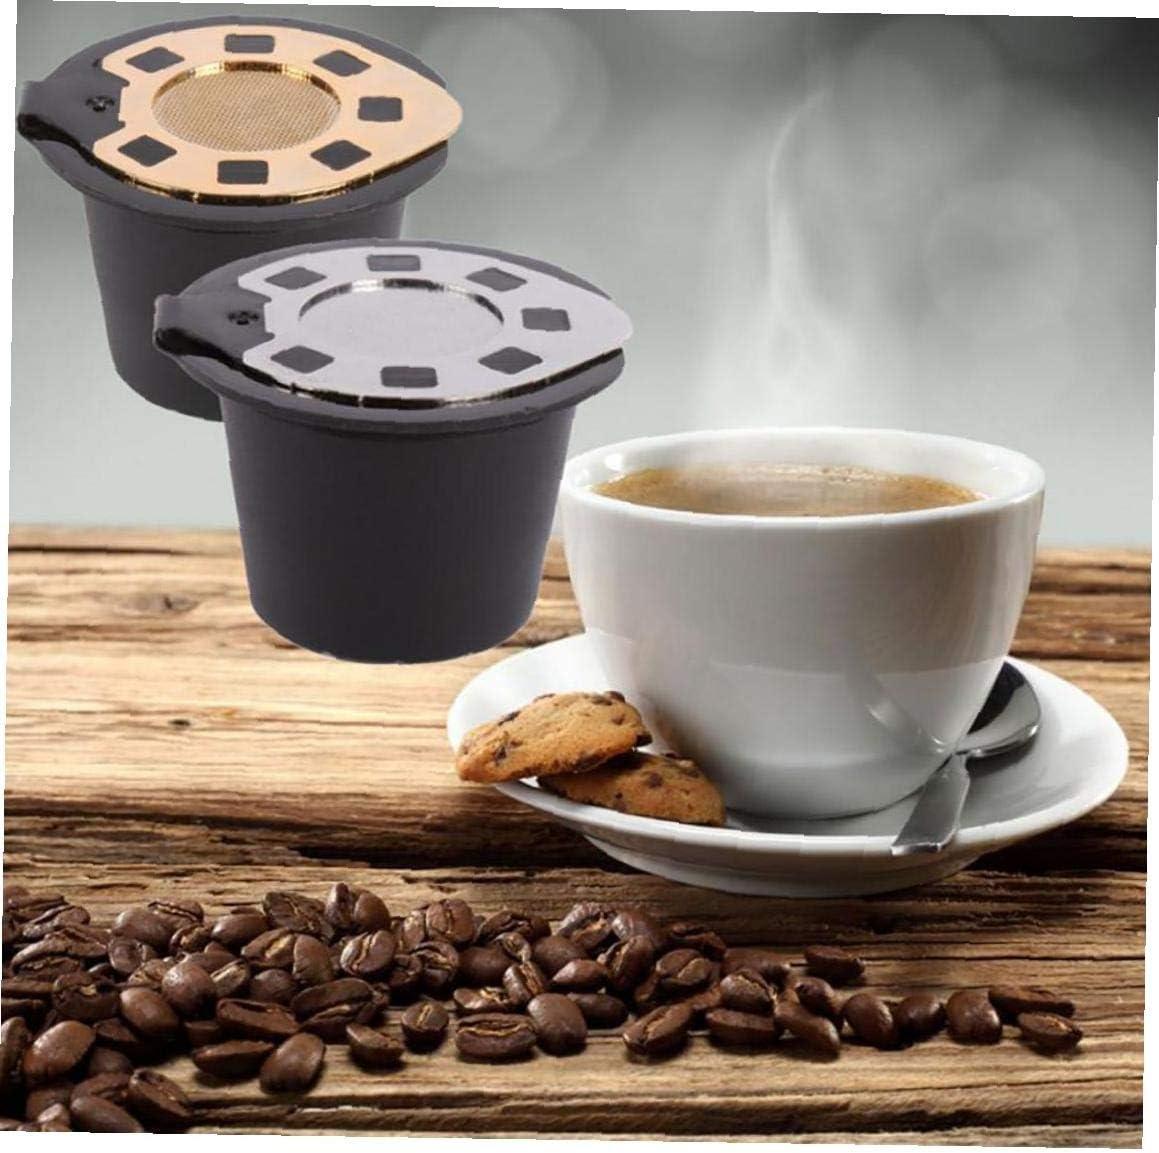 oro Chapado 1pc De Acero Con Tapa De C/ápsulas De Caf/é Nespresso Para Cafetera De Filtro Reutilizable Ecol/ógica 3-5 G Al Caf/é Molido